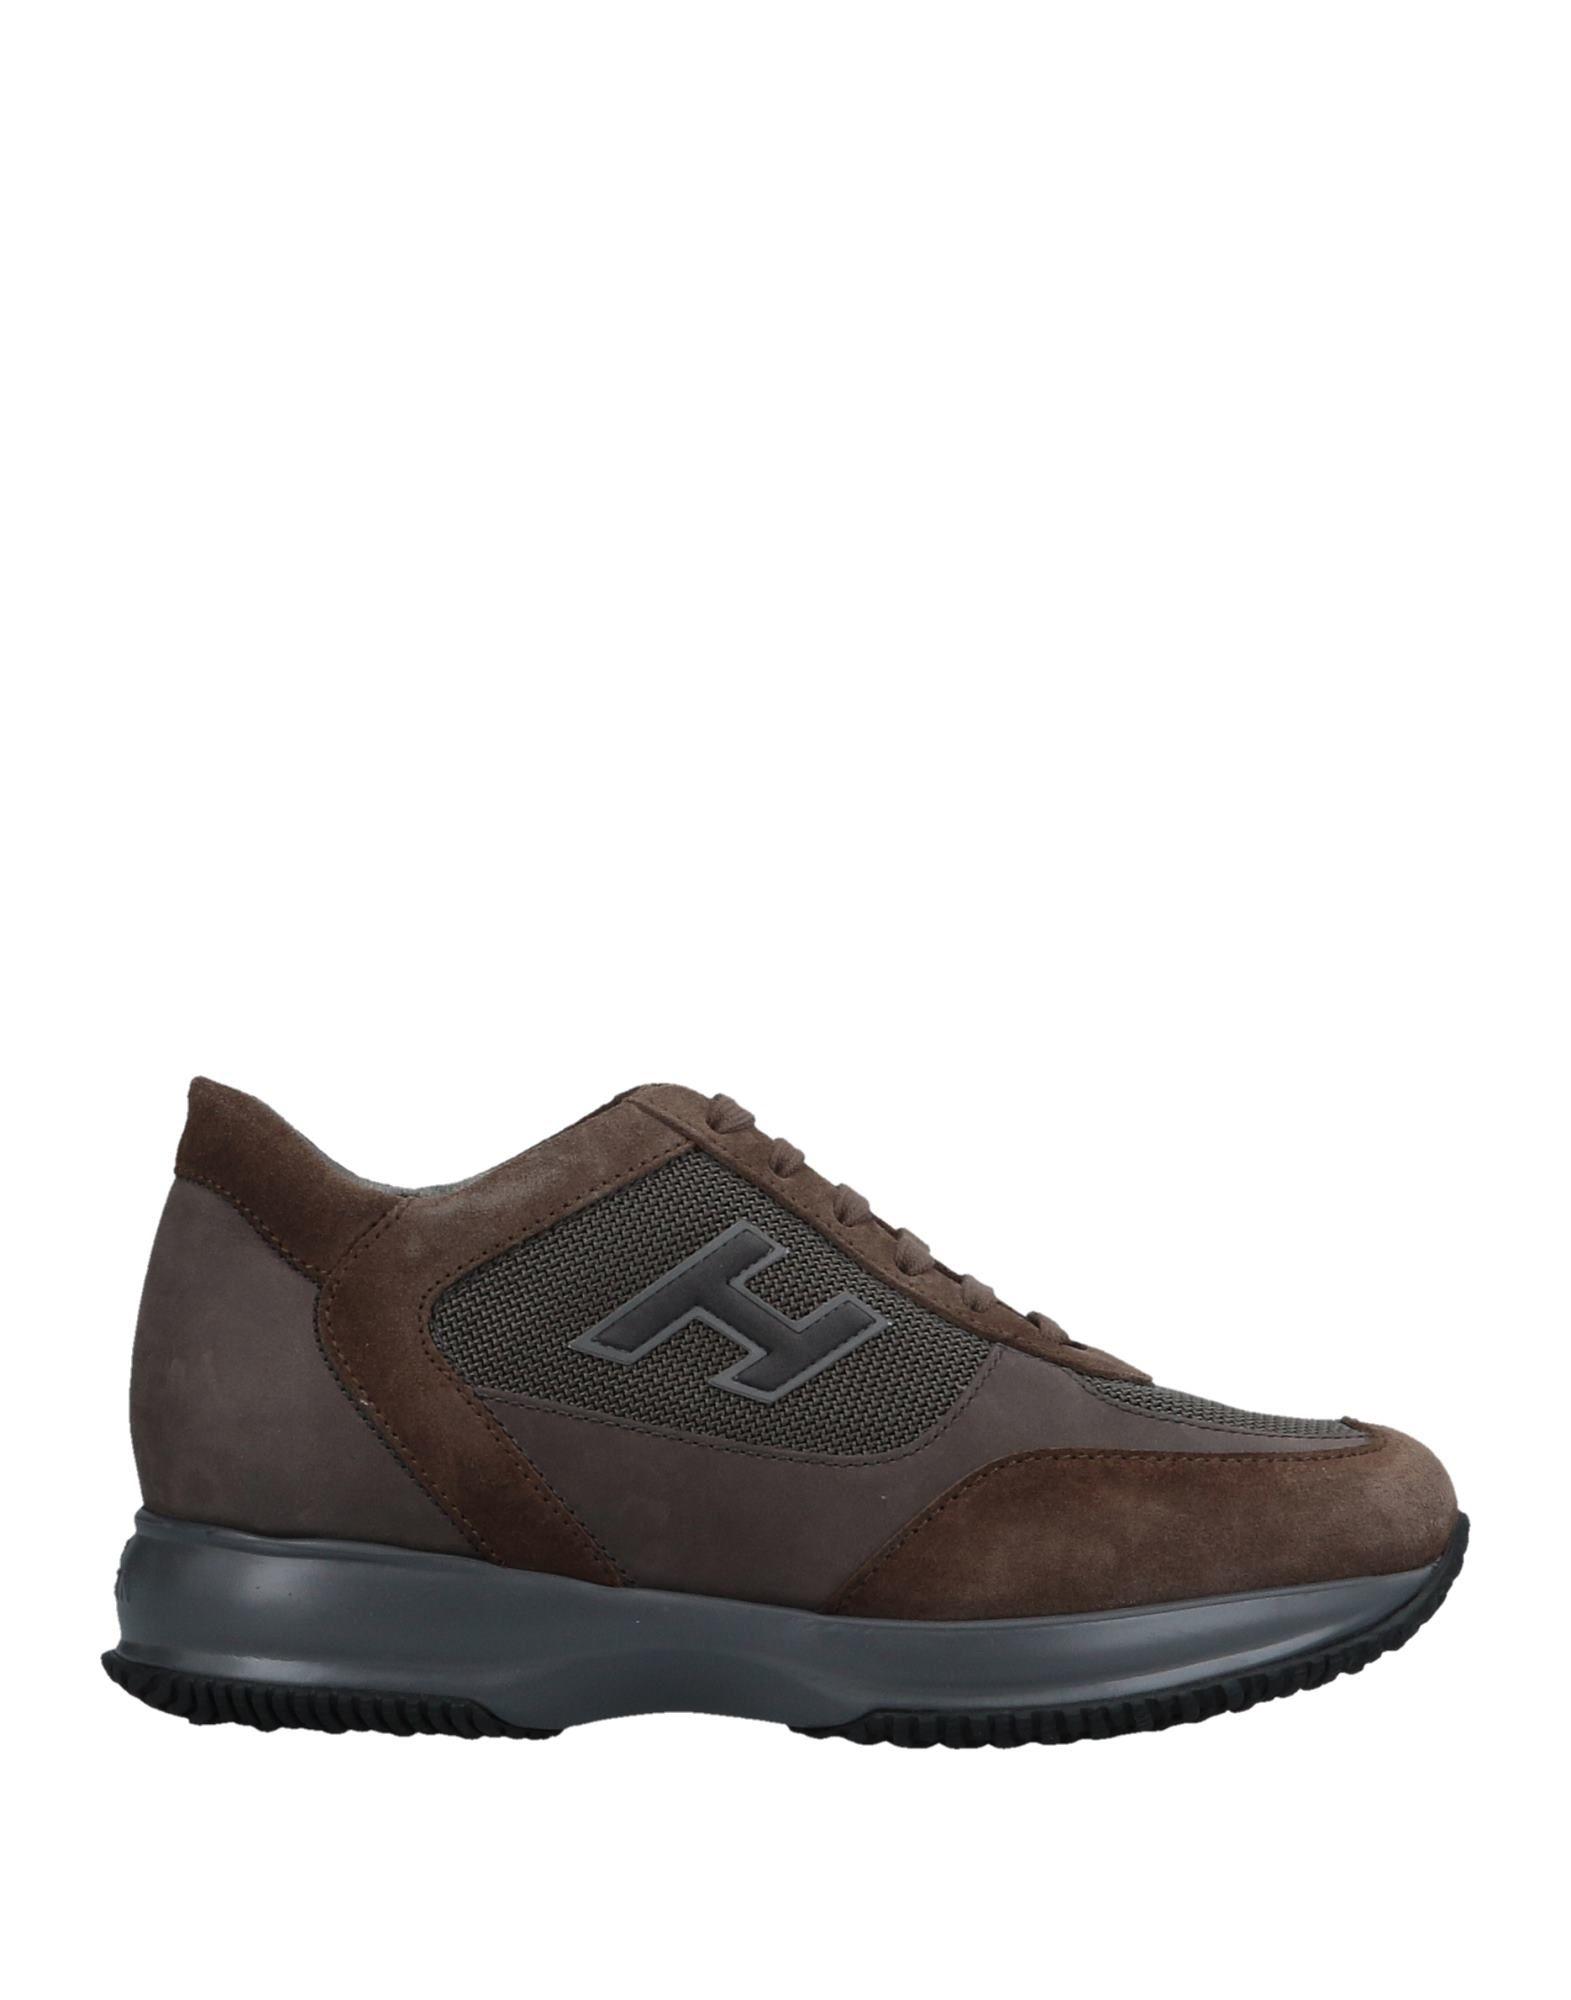 Sneakers Hogan Uomo - 11505399IP elegante